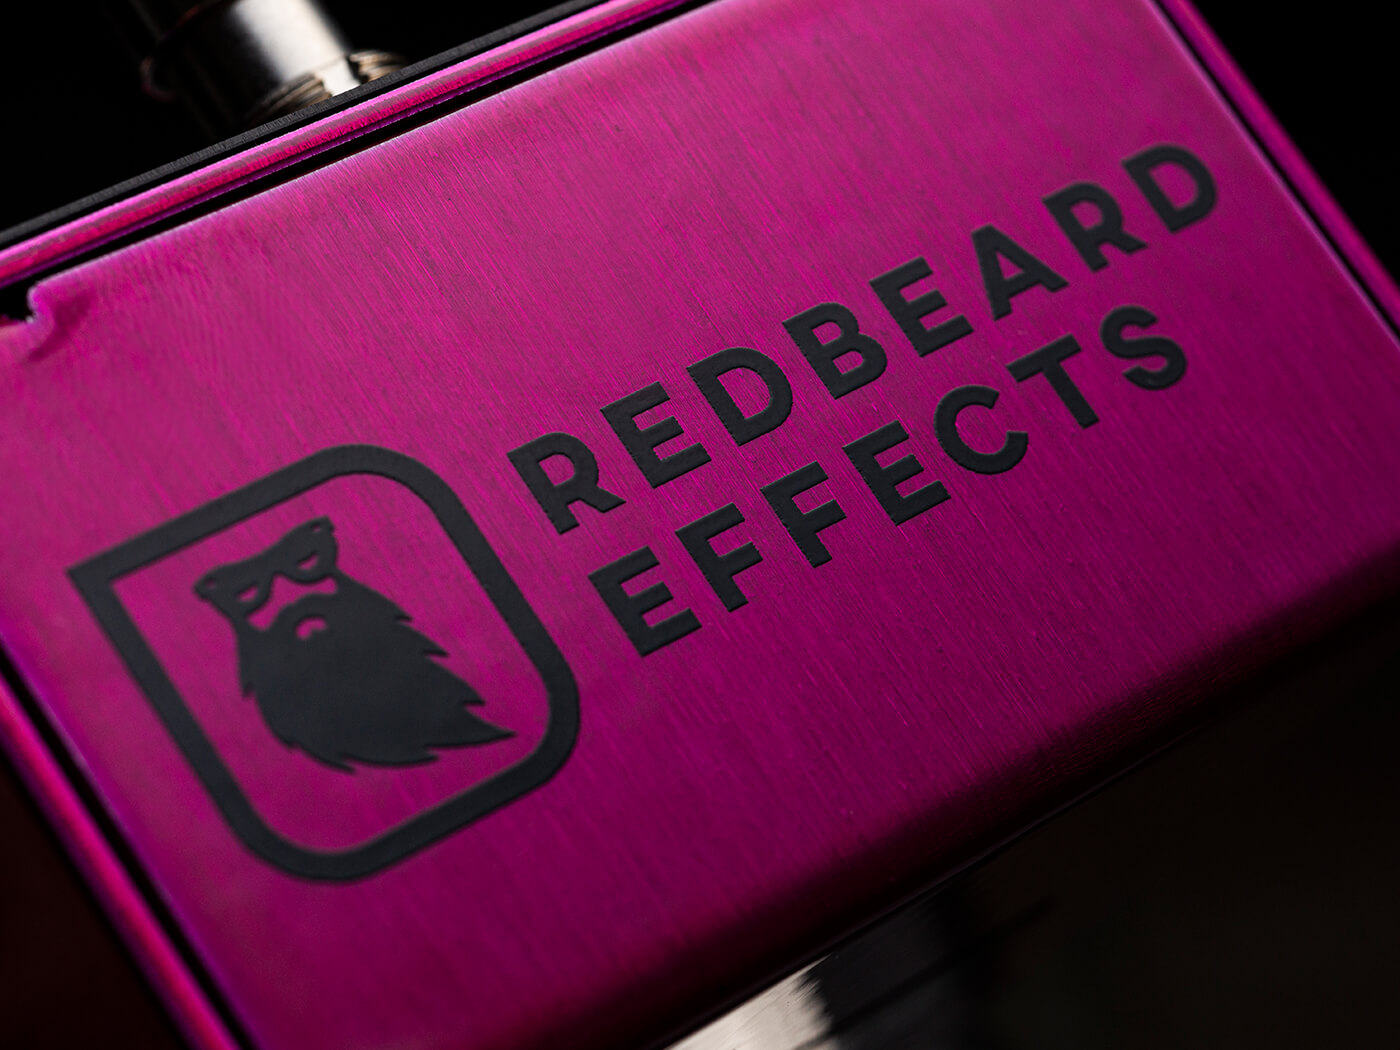 Redbeard Effects Angry Rhubarb